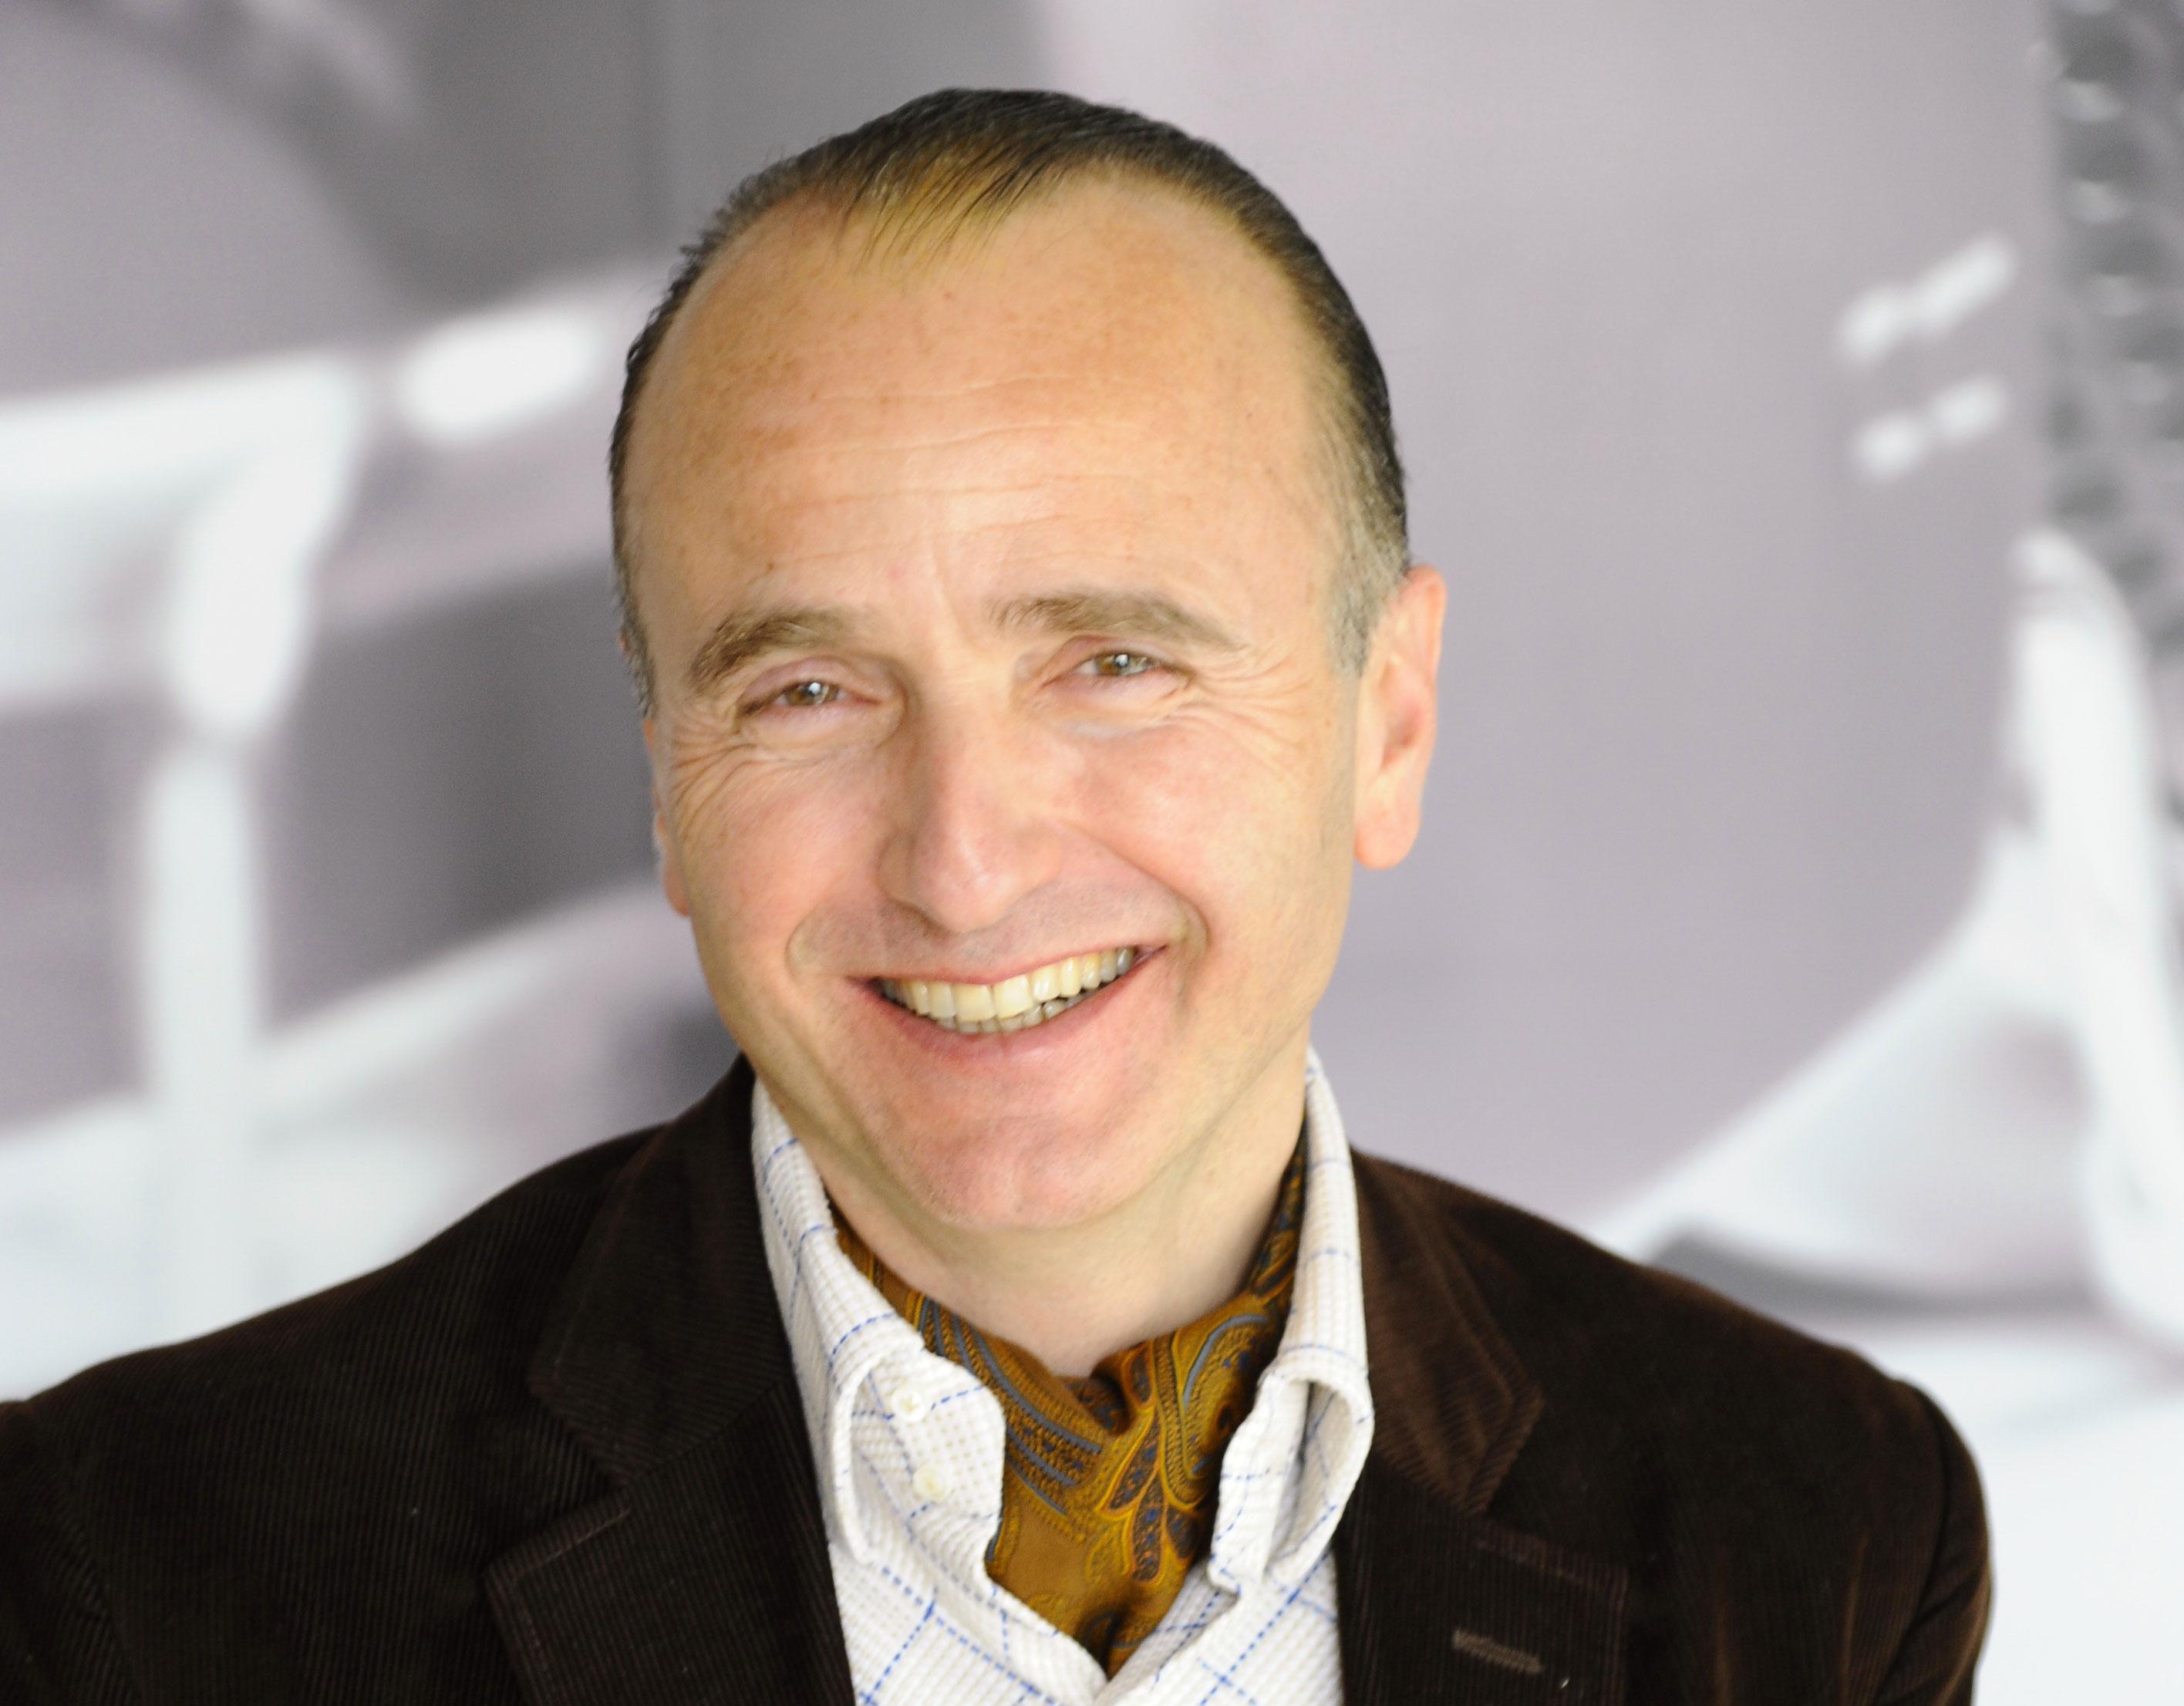 Laurent Vronski